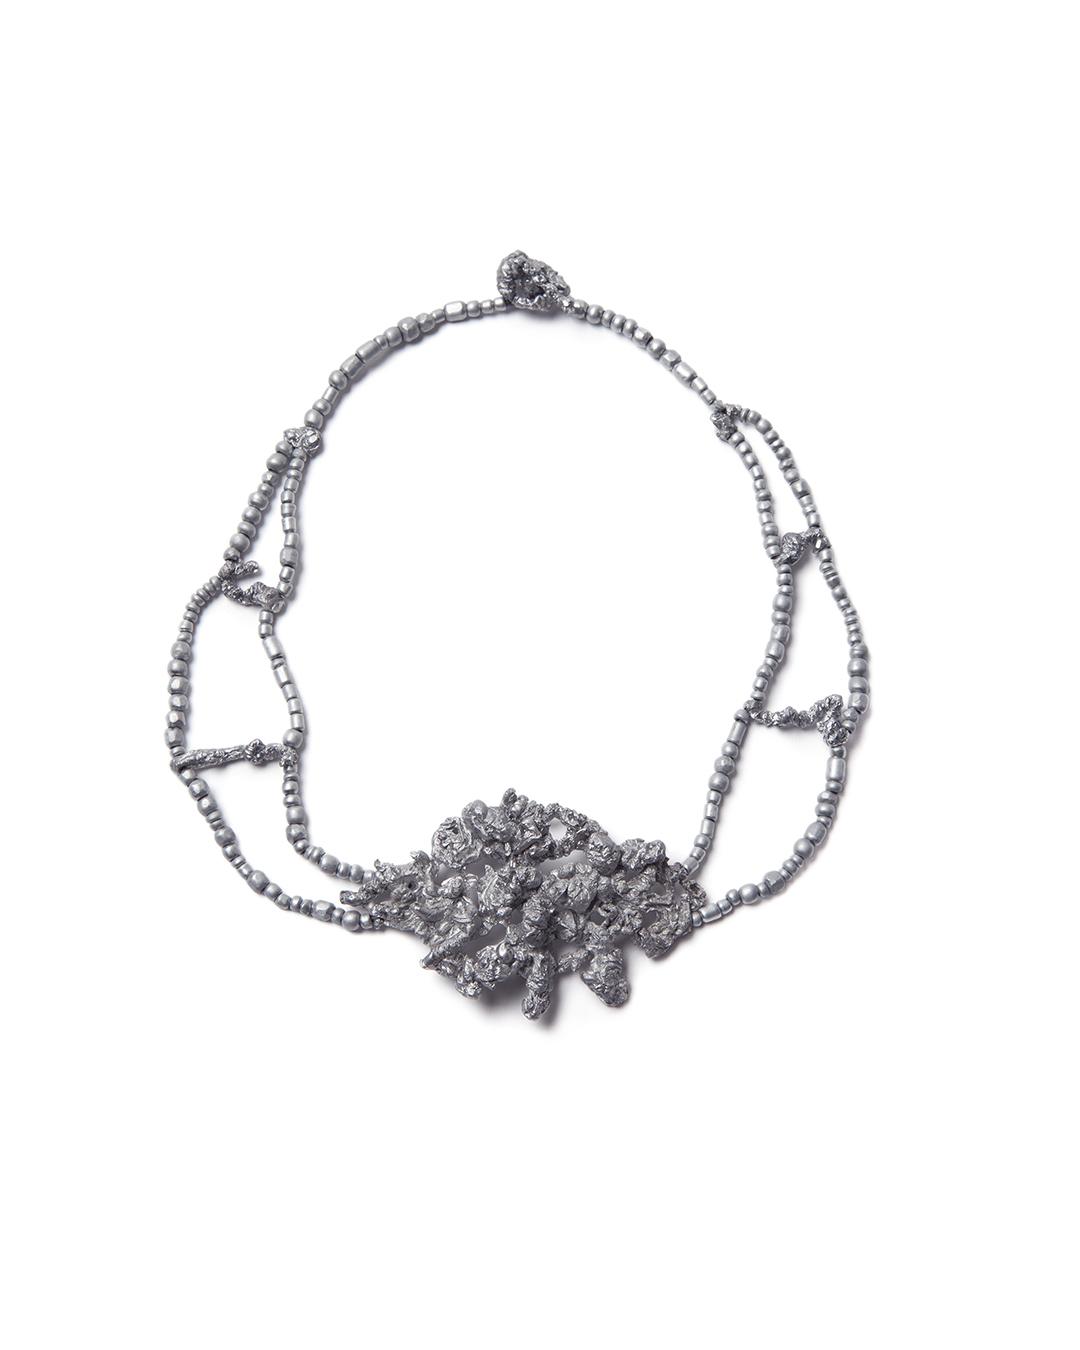 Barbara Schrobenhauser, Ropes I, 2015, necklace; aluminium, string, L 420; element 70 x 35 x 14 mm, €1575